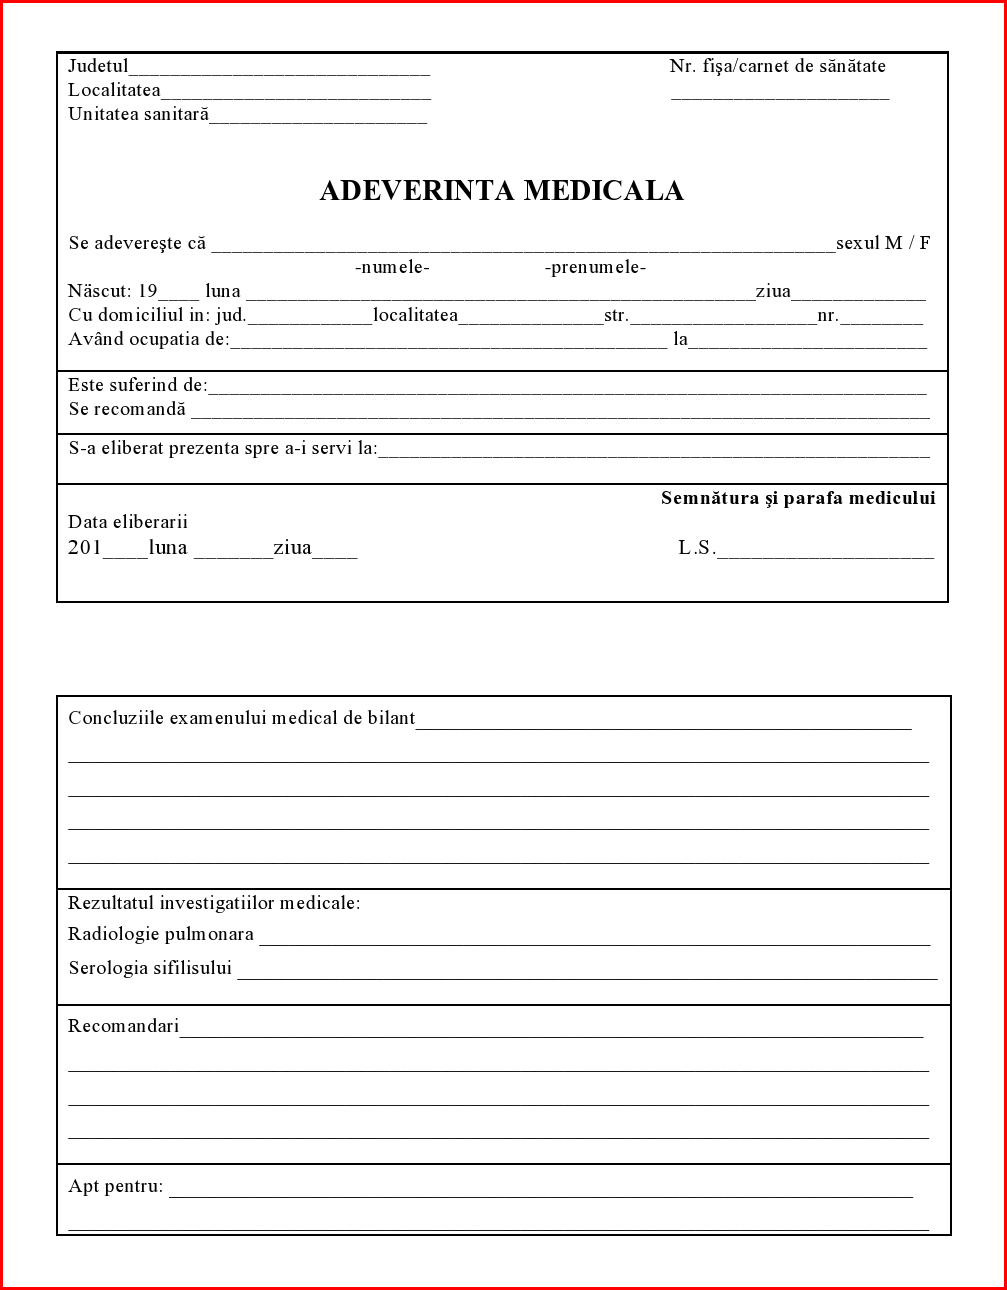 adeverinta medicala online